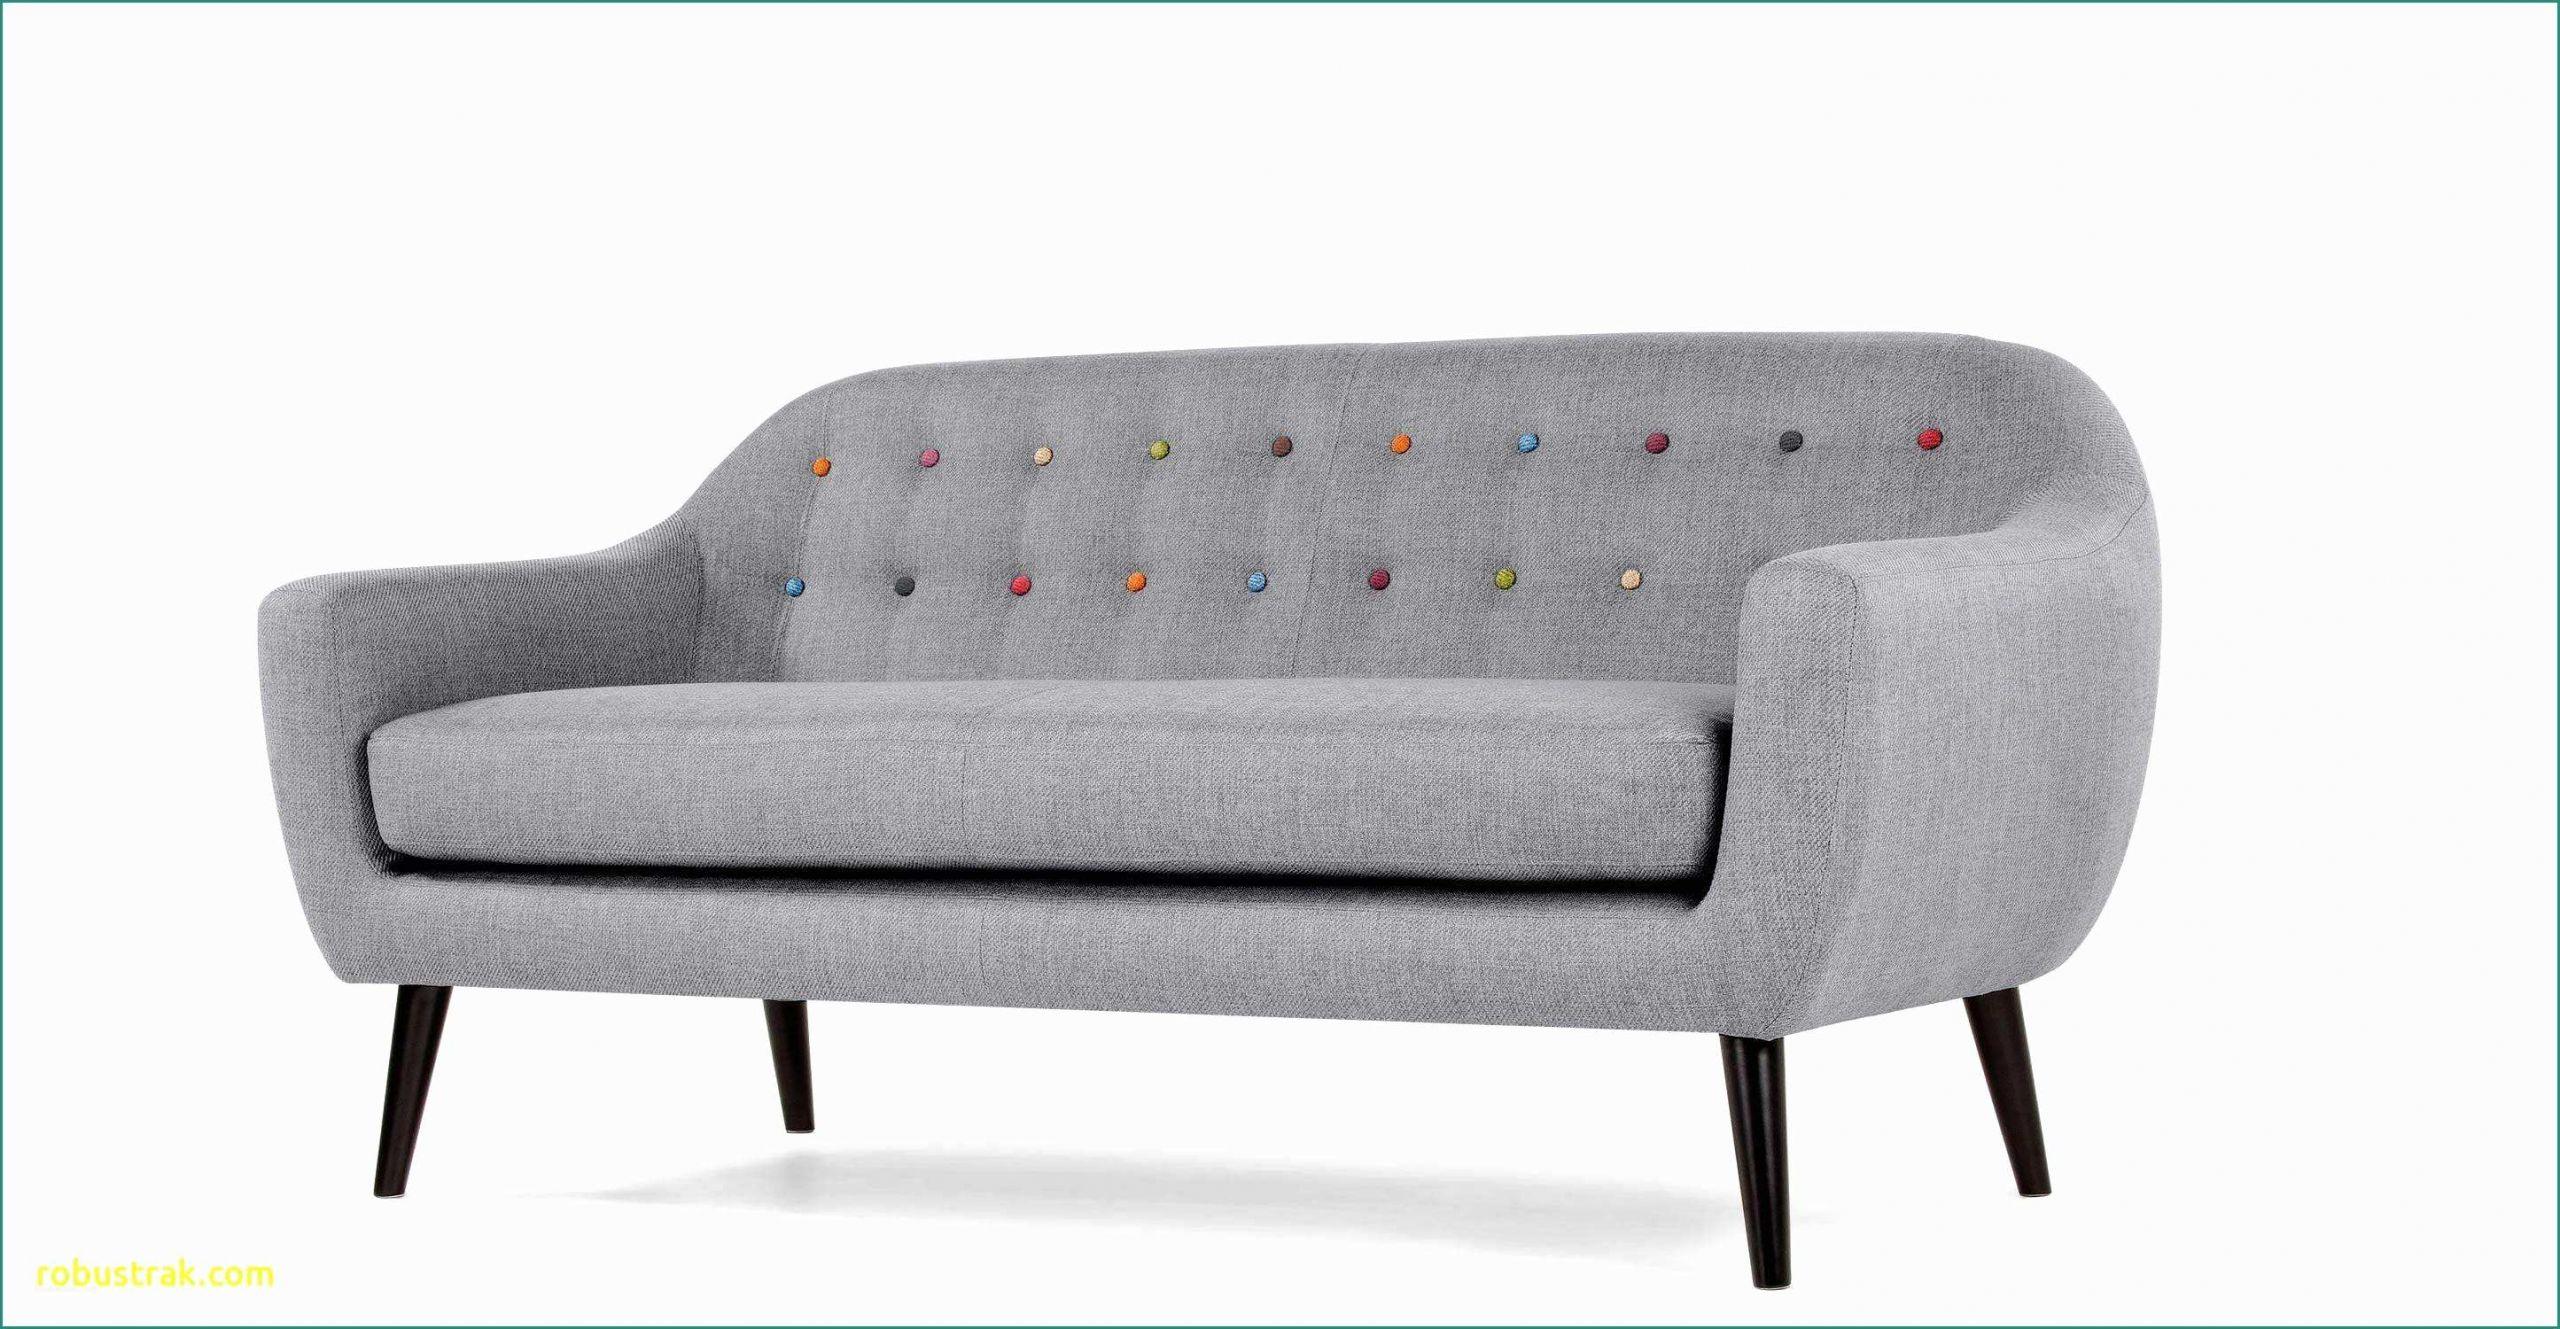 chaise longue divano e couch rosa neu ecksofa rosa schon weiche sofas 0d bestes bett und di chaise longue divano